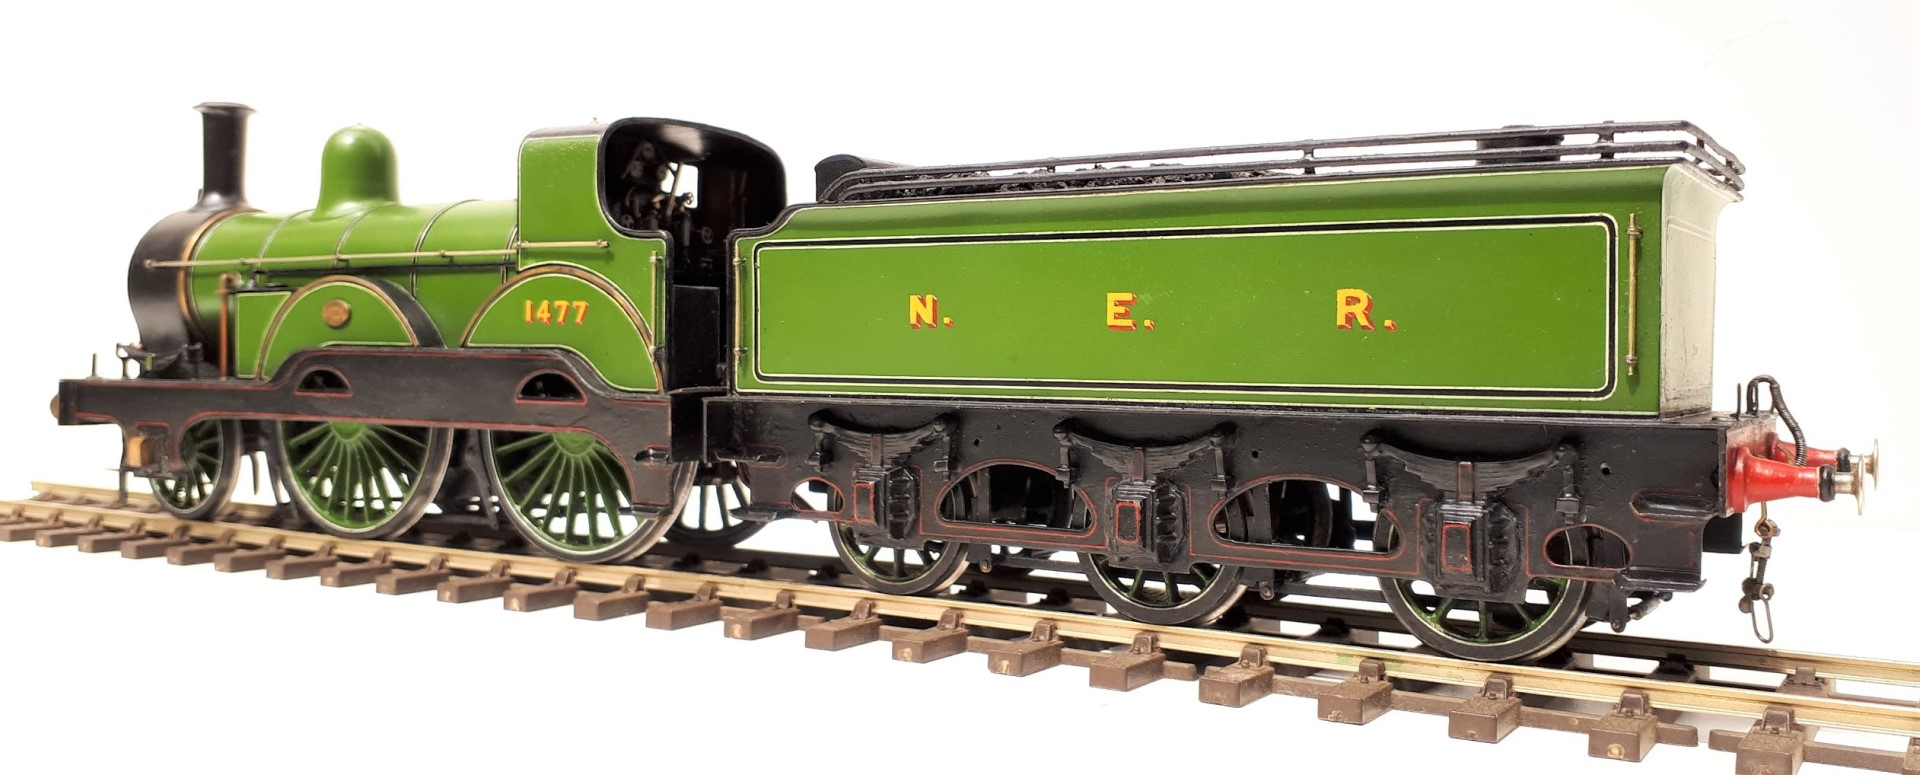 NER Tennant 2-4-0 1477